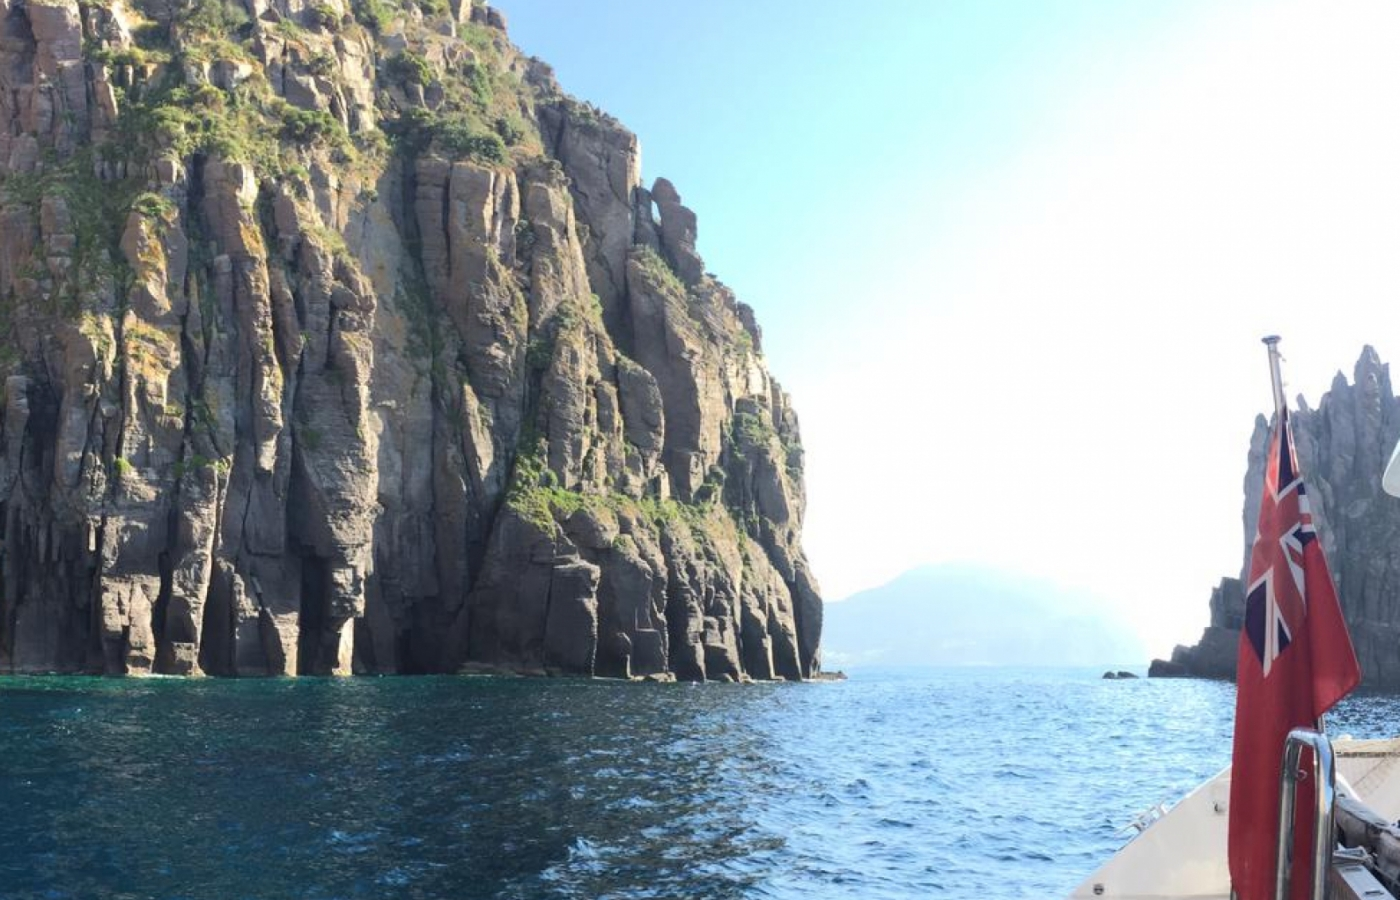 Views from the sailing catamaran of the Amalfi Coast